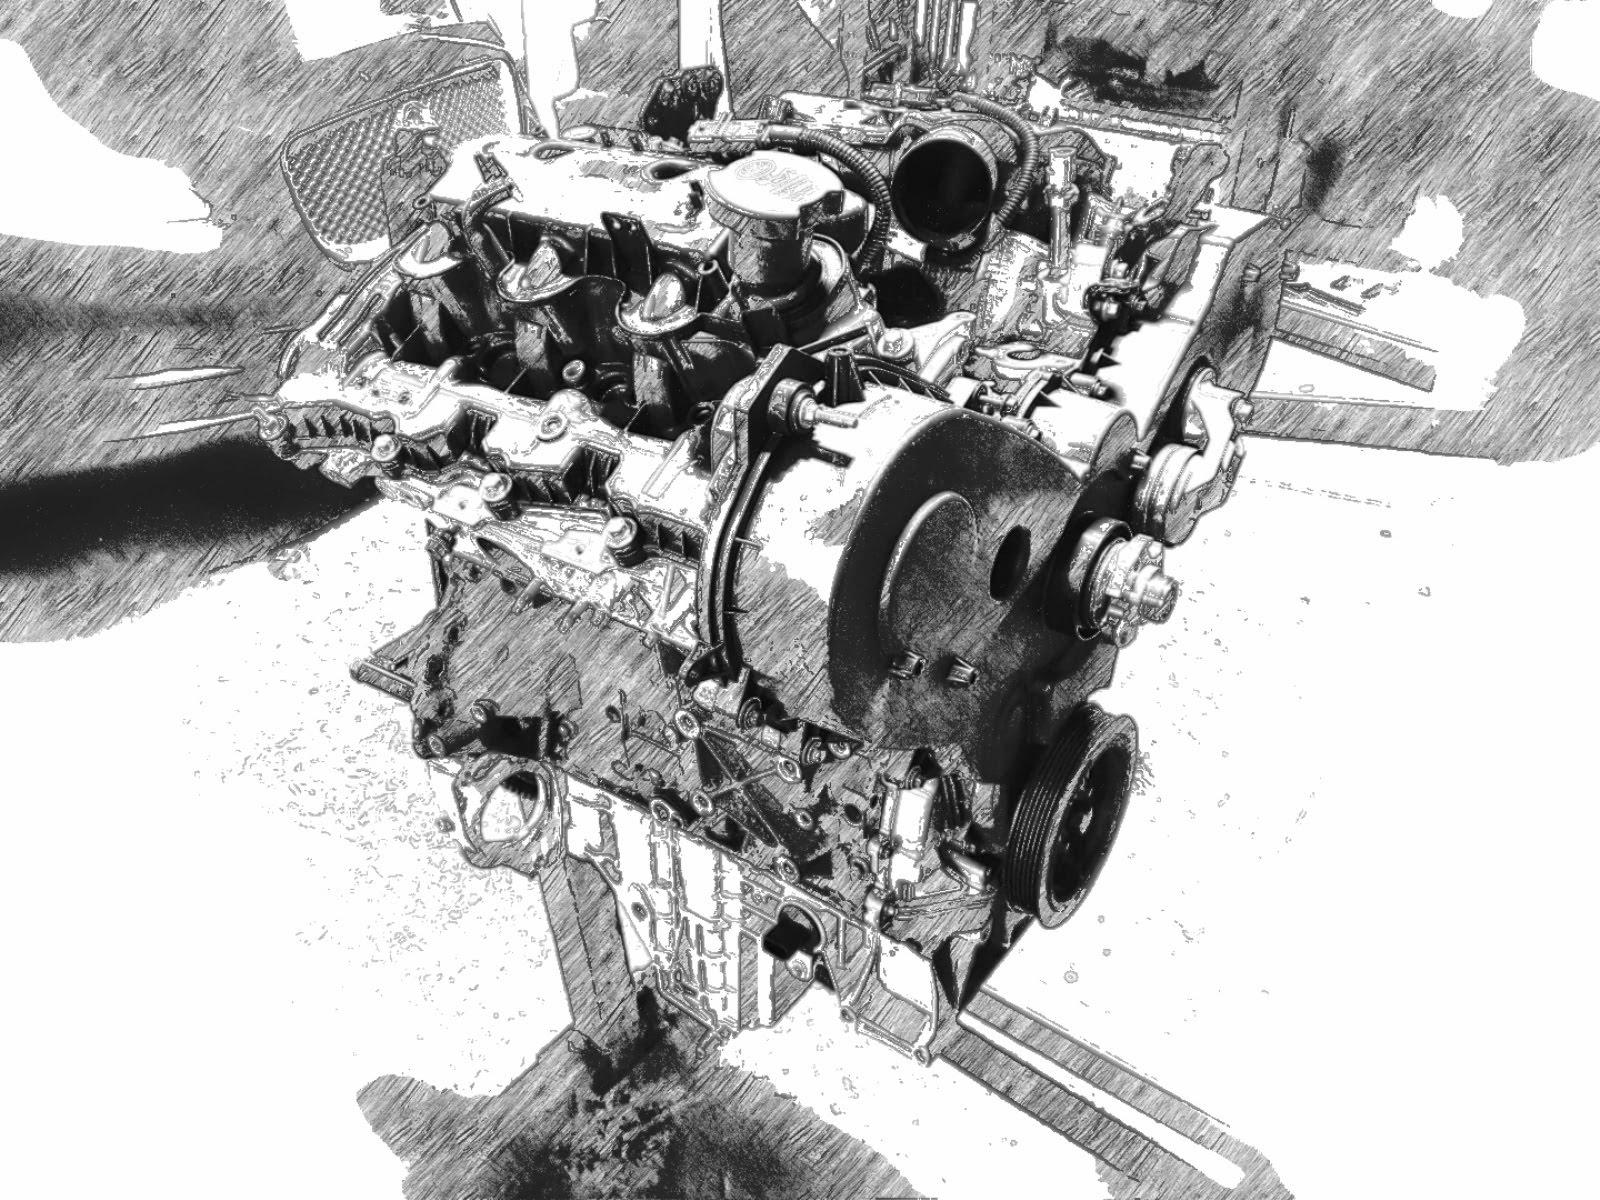 Land Rover 2.7 tdv6 engine